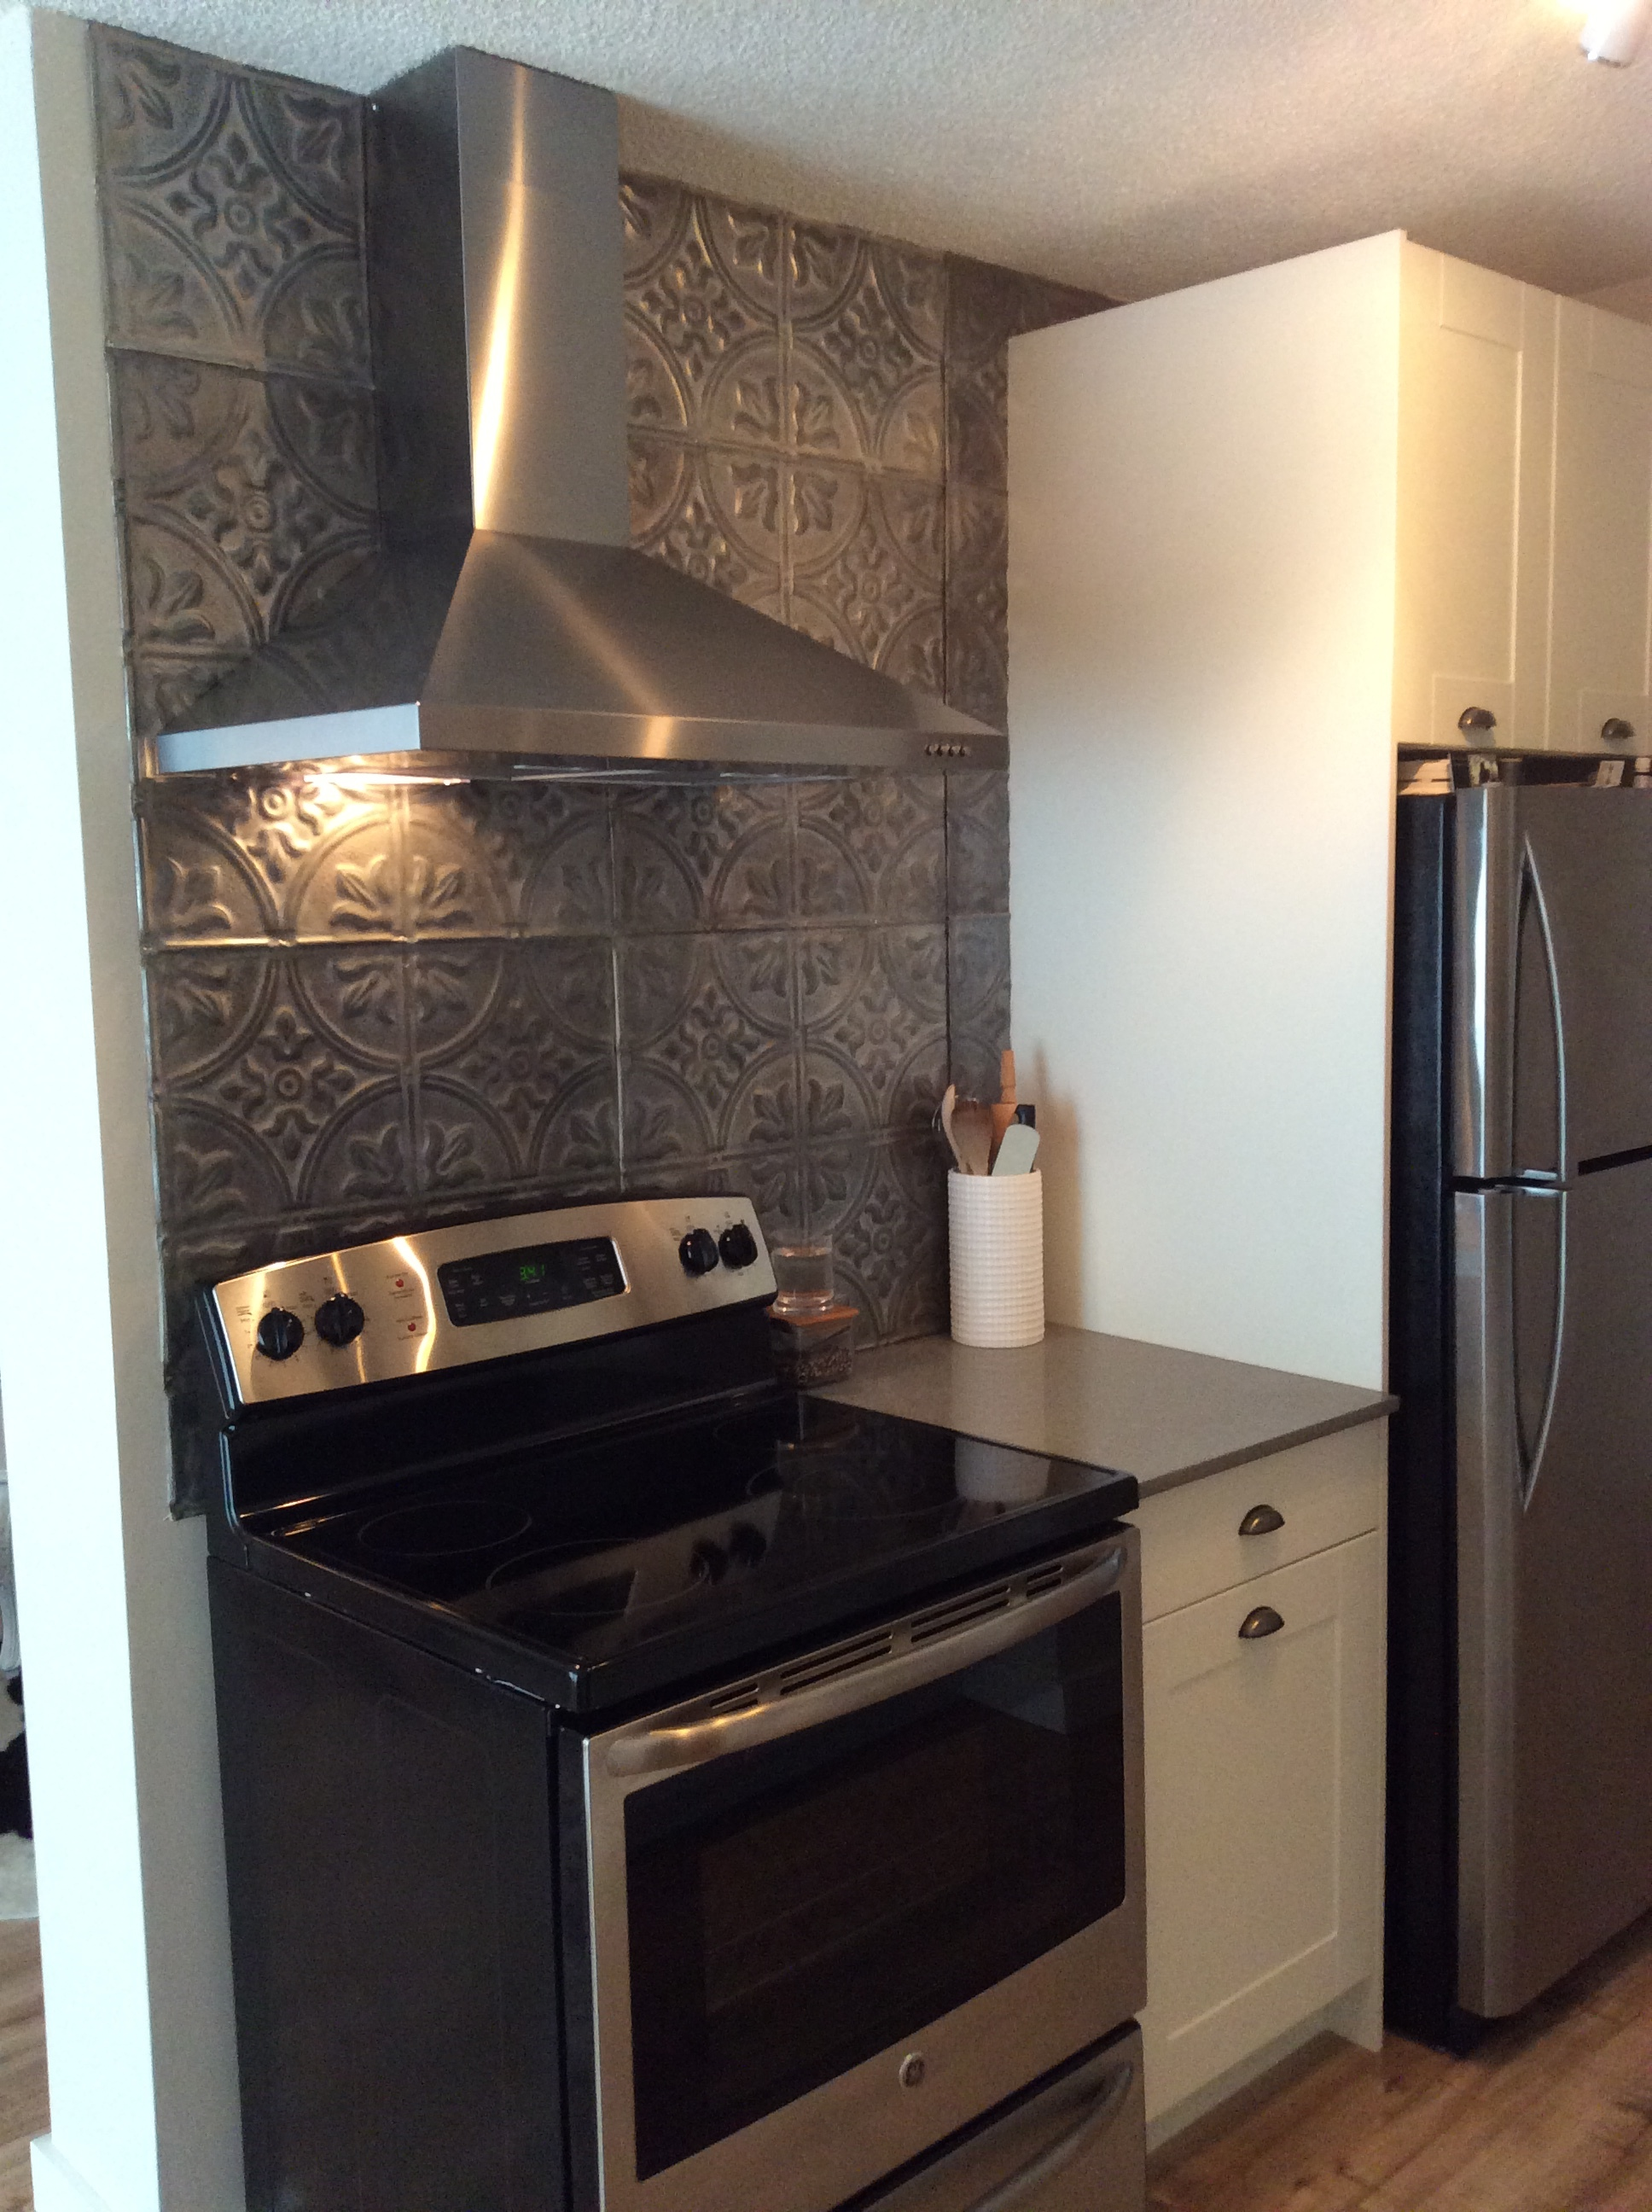 Ikea kitchen, tin tile backsplash, and stainless steel range and range hood.